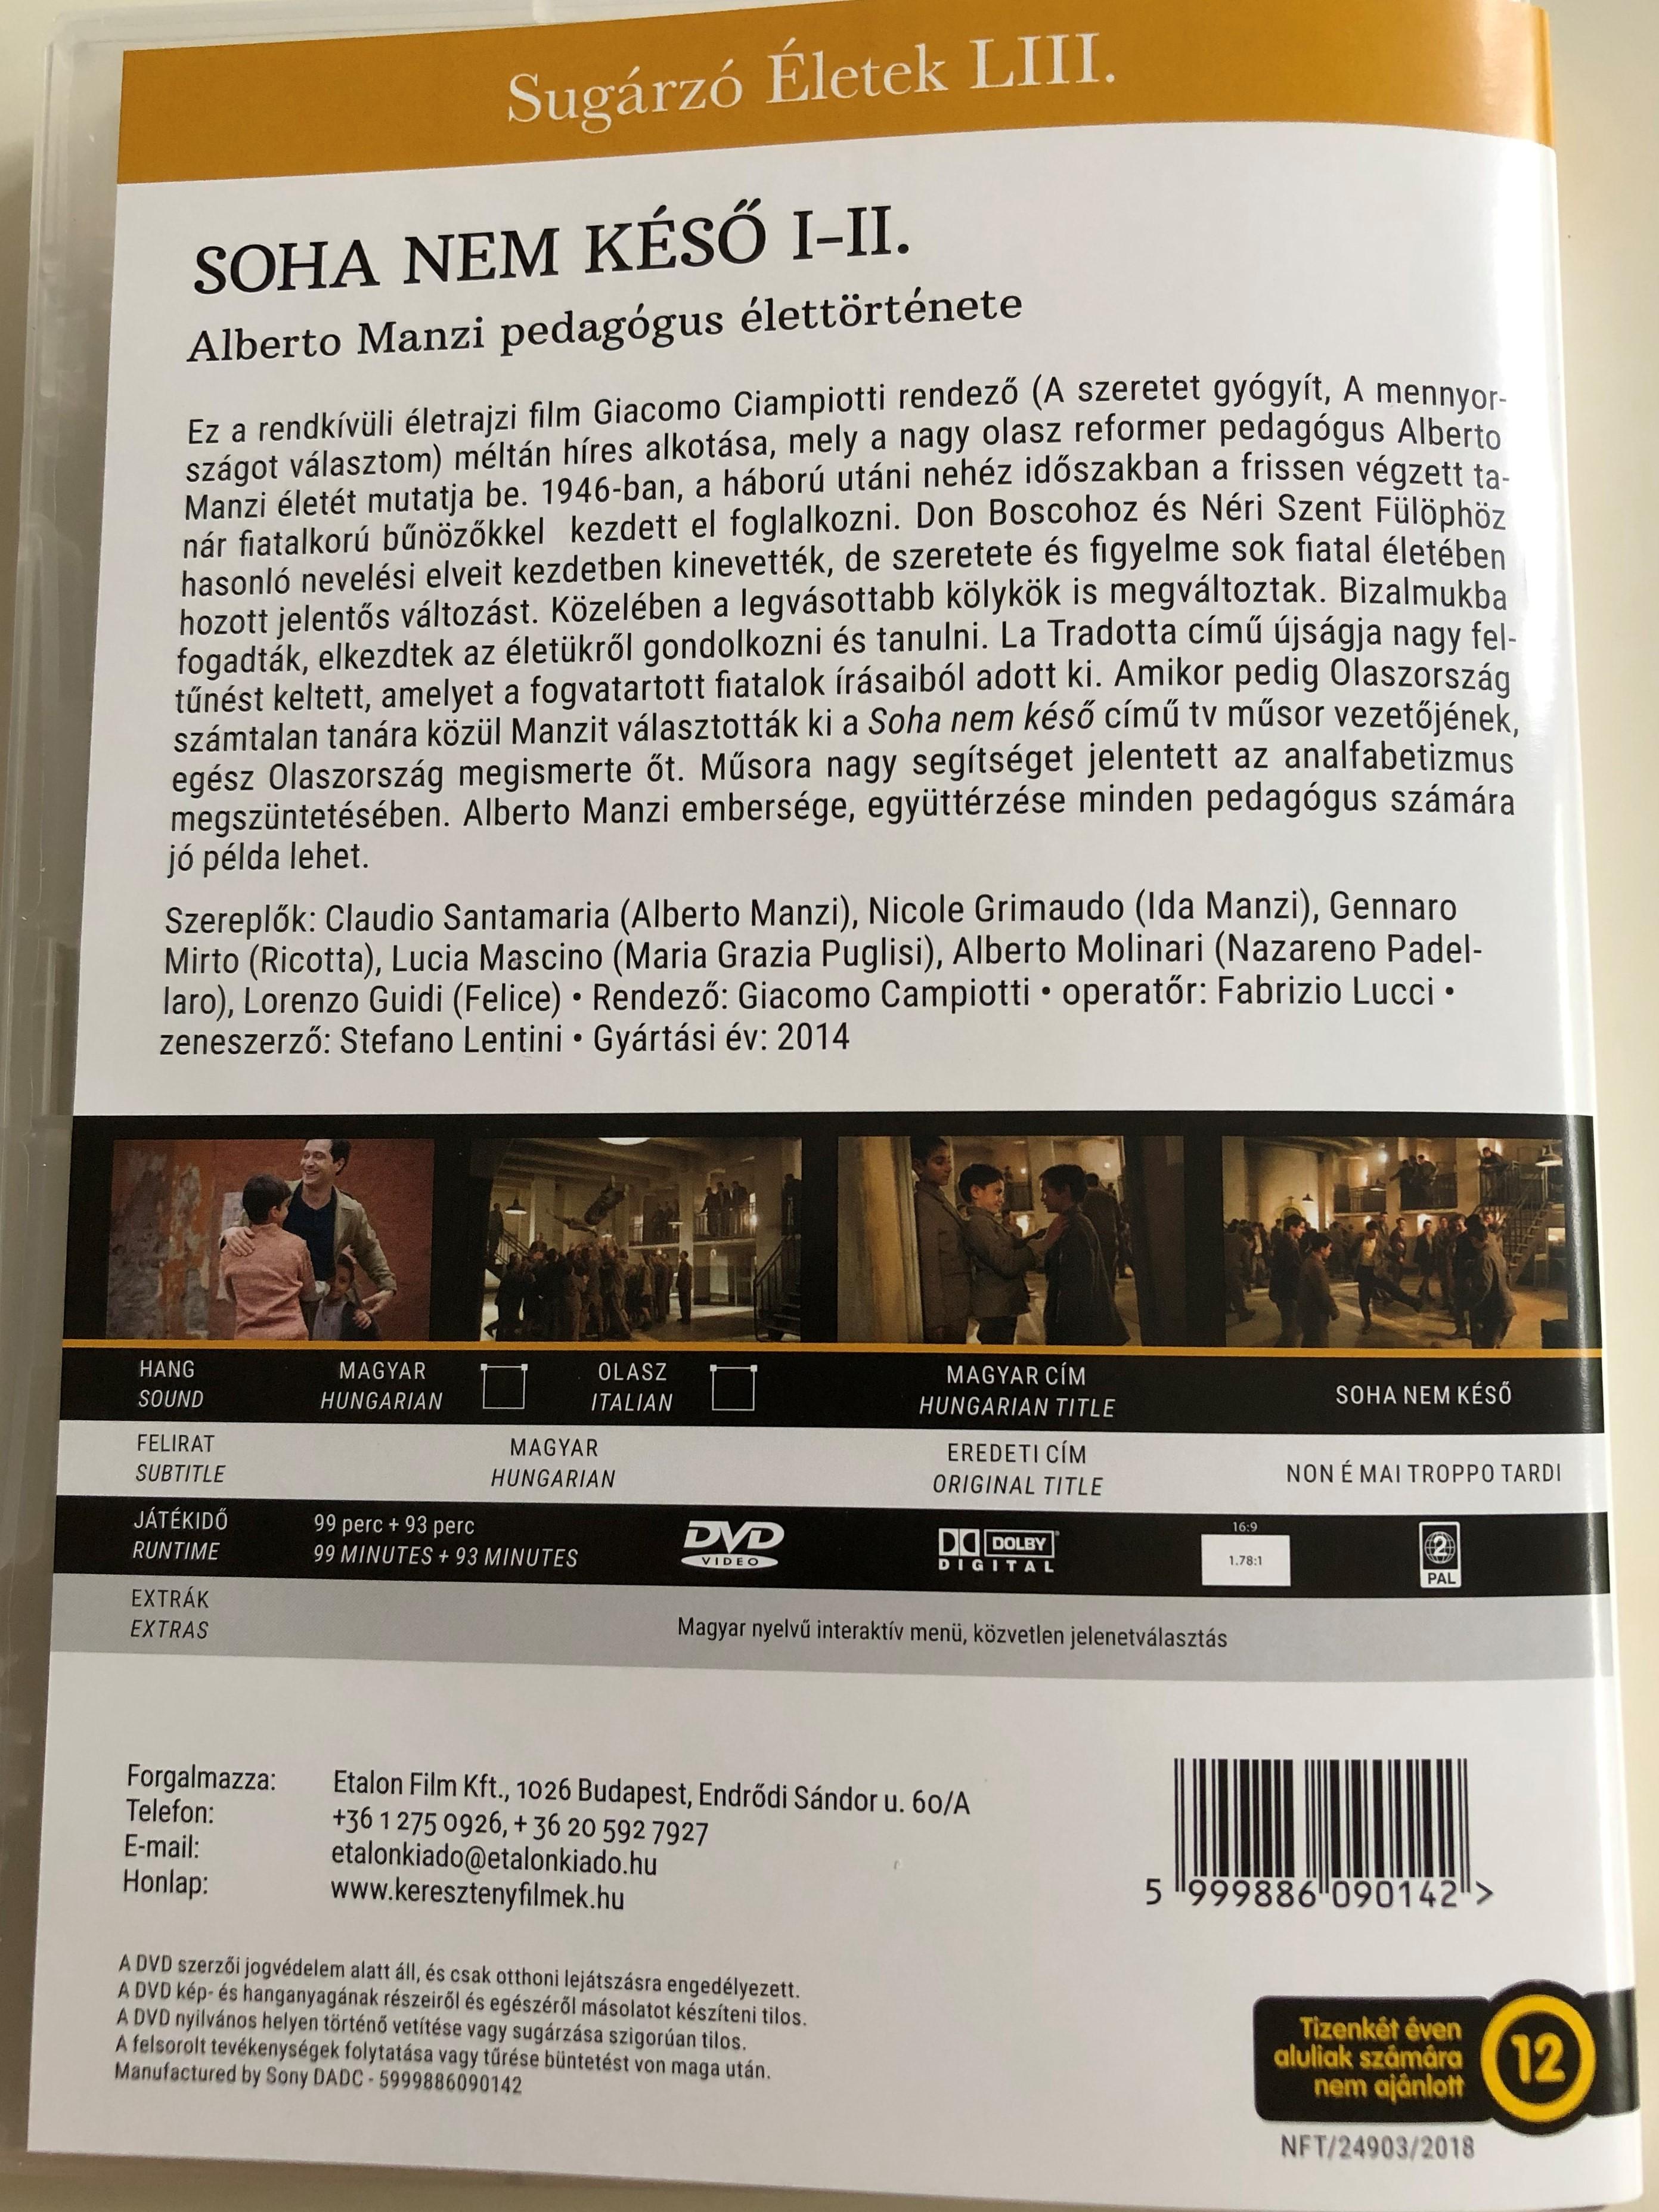 non-mai-troppo-tarti-i-ii.-dvd-2014-soha-nem-k-s-i-ii.-directed-by-giacomo-campiotti-starring-claudio-santamaria-nicole-grimaudo-gennaro-mirto-lucio-mscino-alberto-molinari-3-.jpg